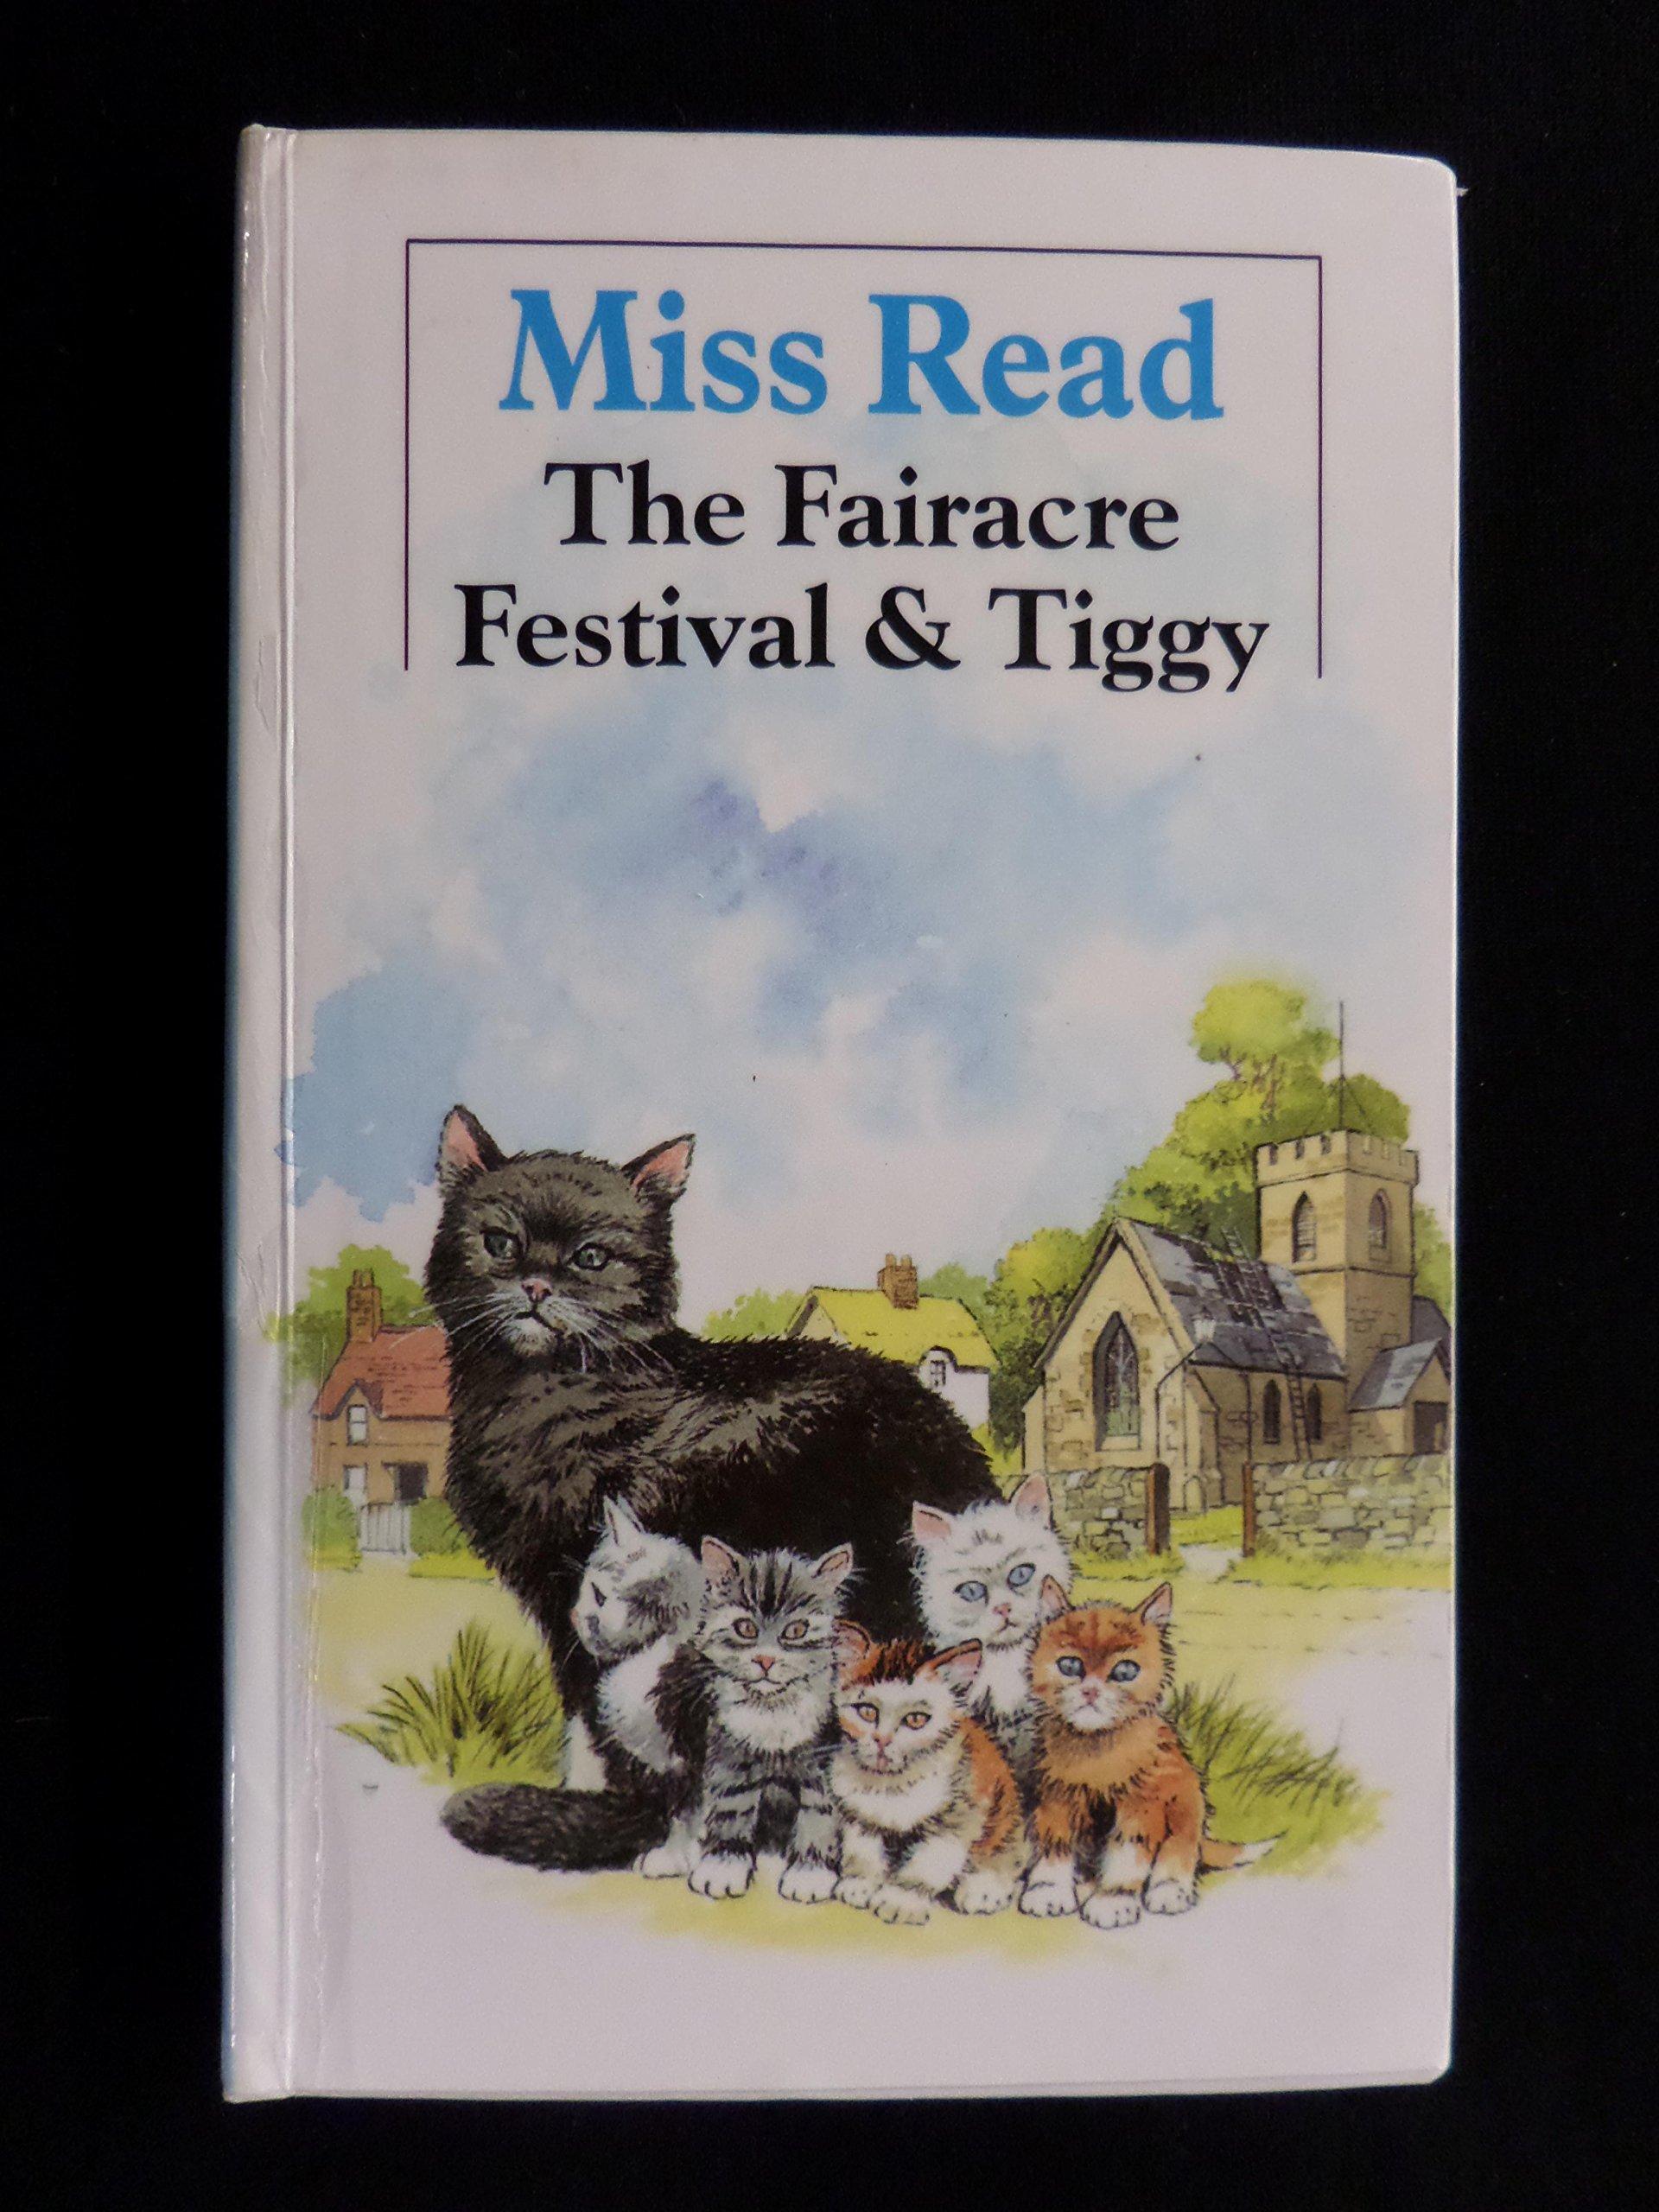 The Fairacre Festival & Tiggy (The Fairacre Series #7) (Miss Read) pdf epub